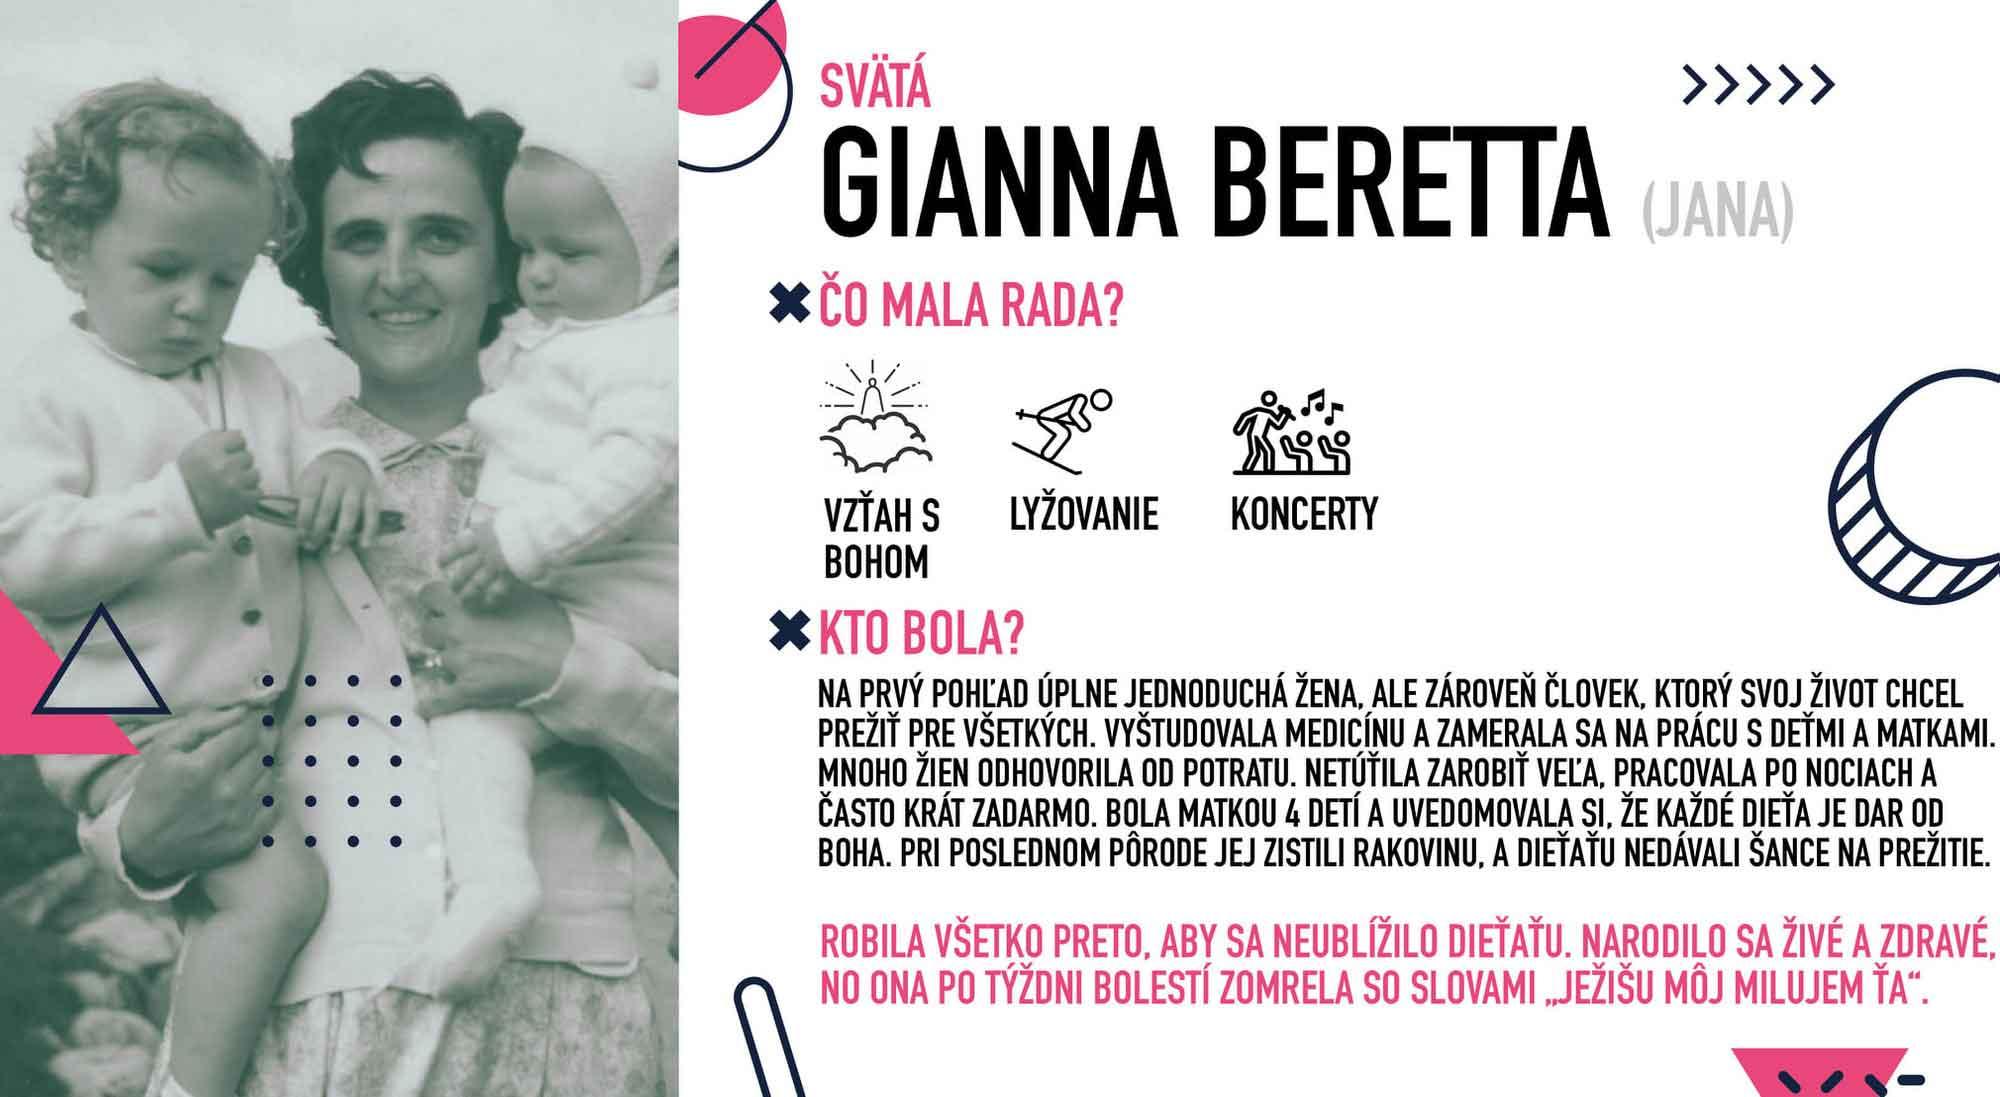 Gianna Beretta